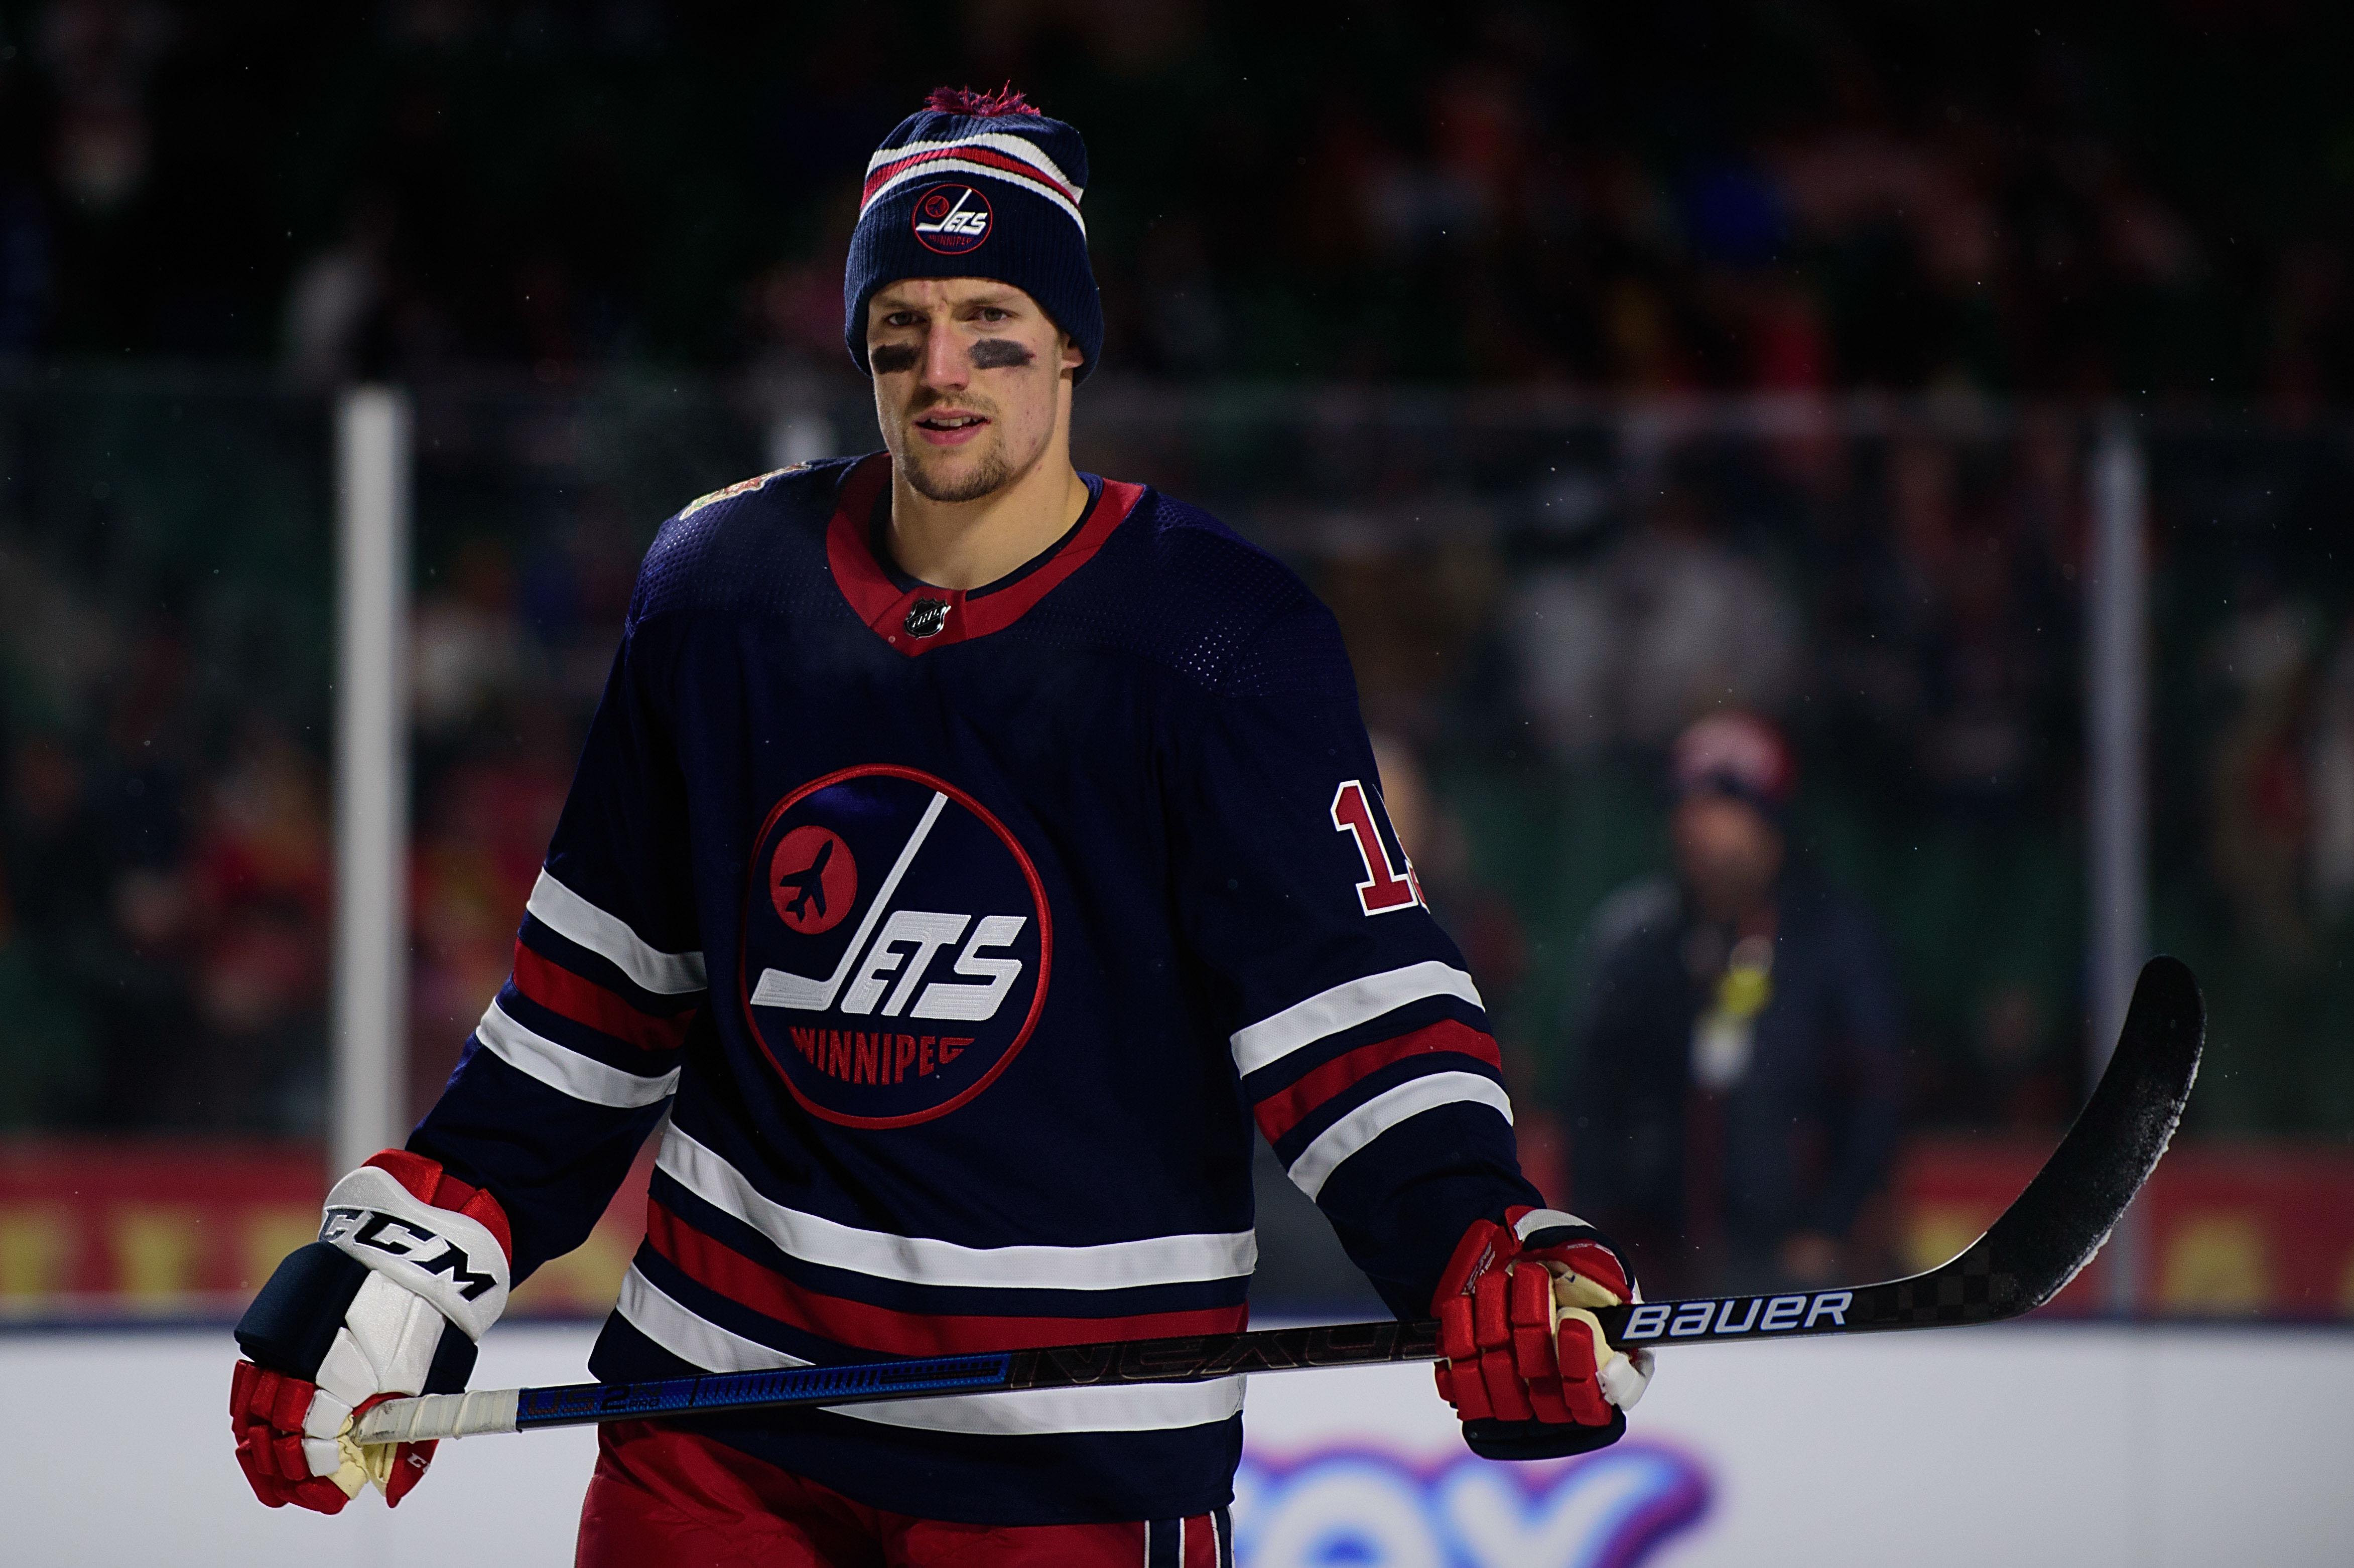 NHL: Heritage Classic-Calgary Flames at Winnipeg Jets